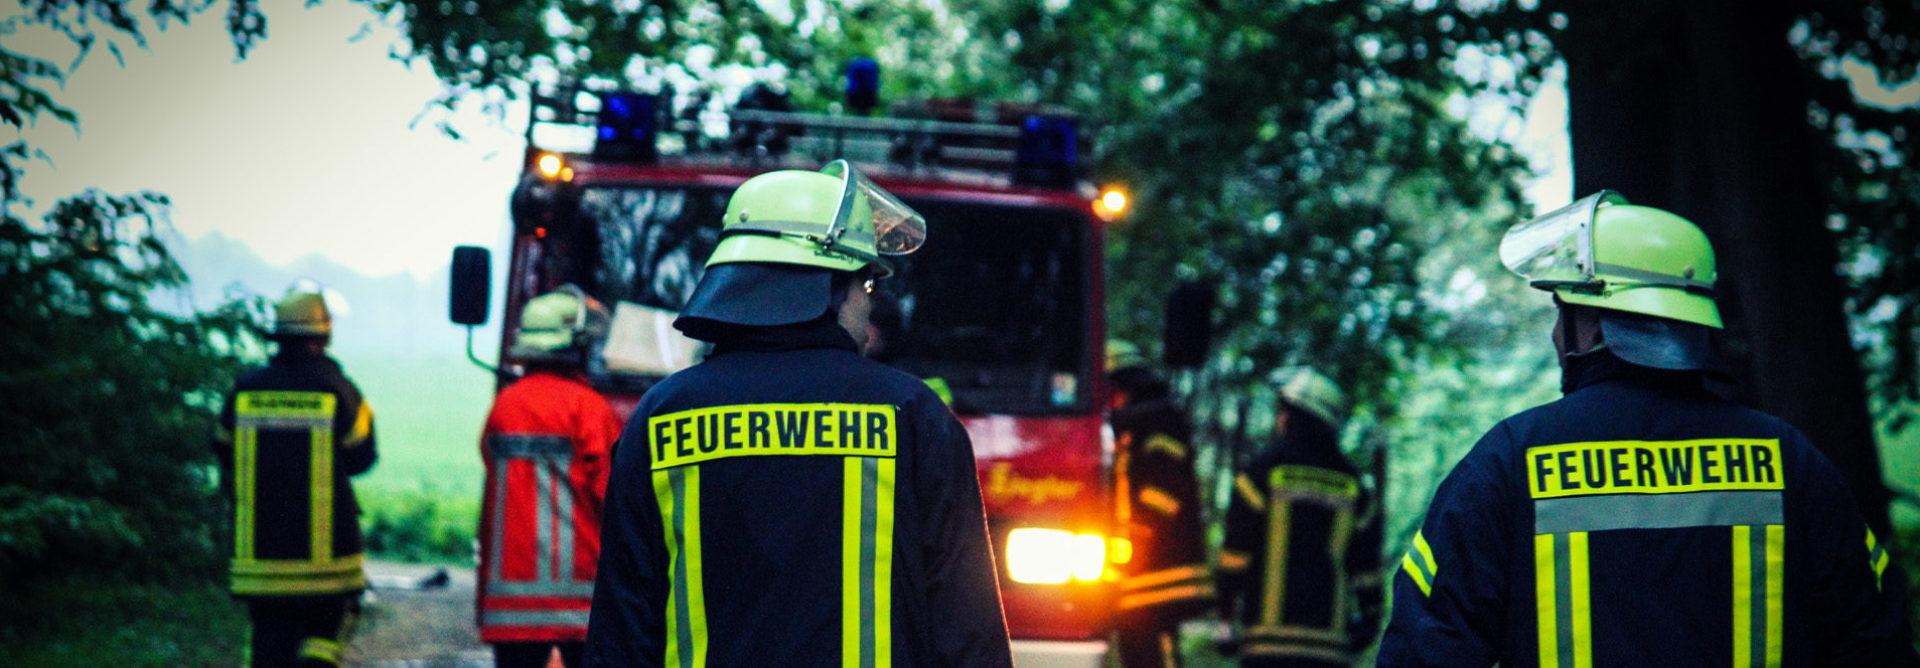 Freiwillige Feuerwehr Hemmingen